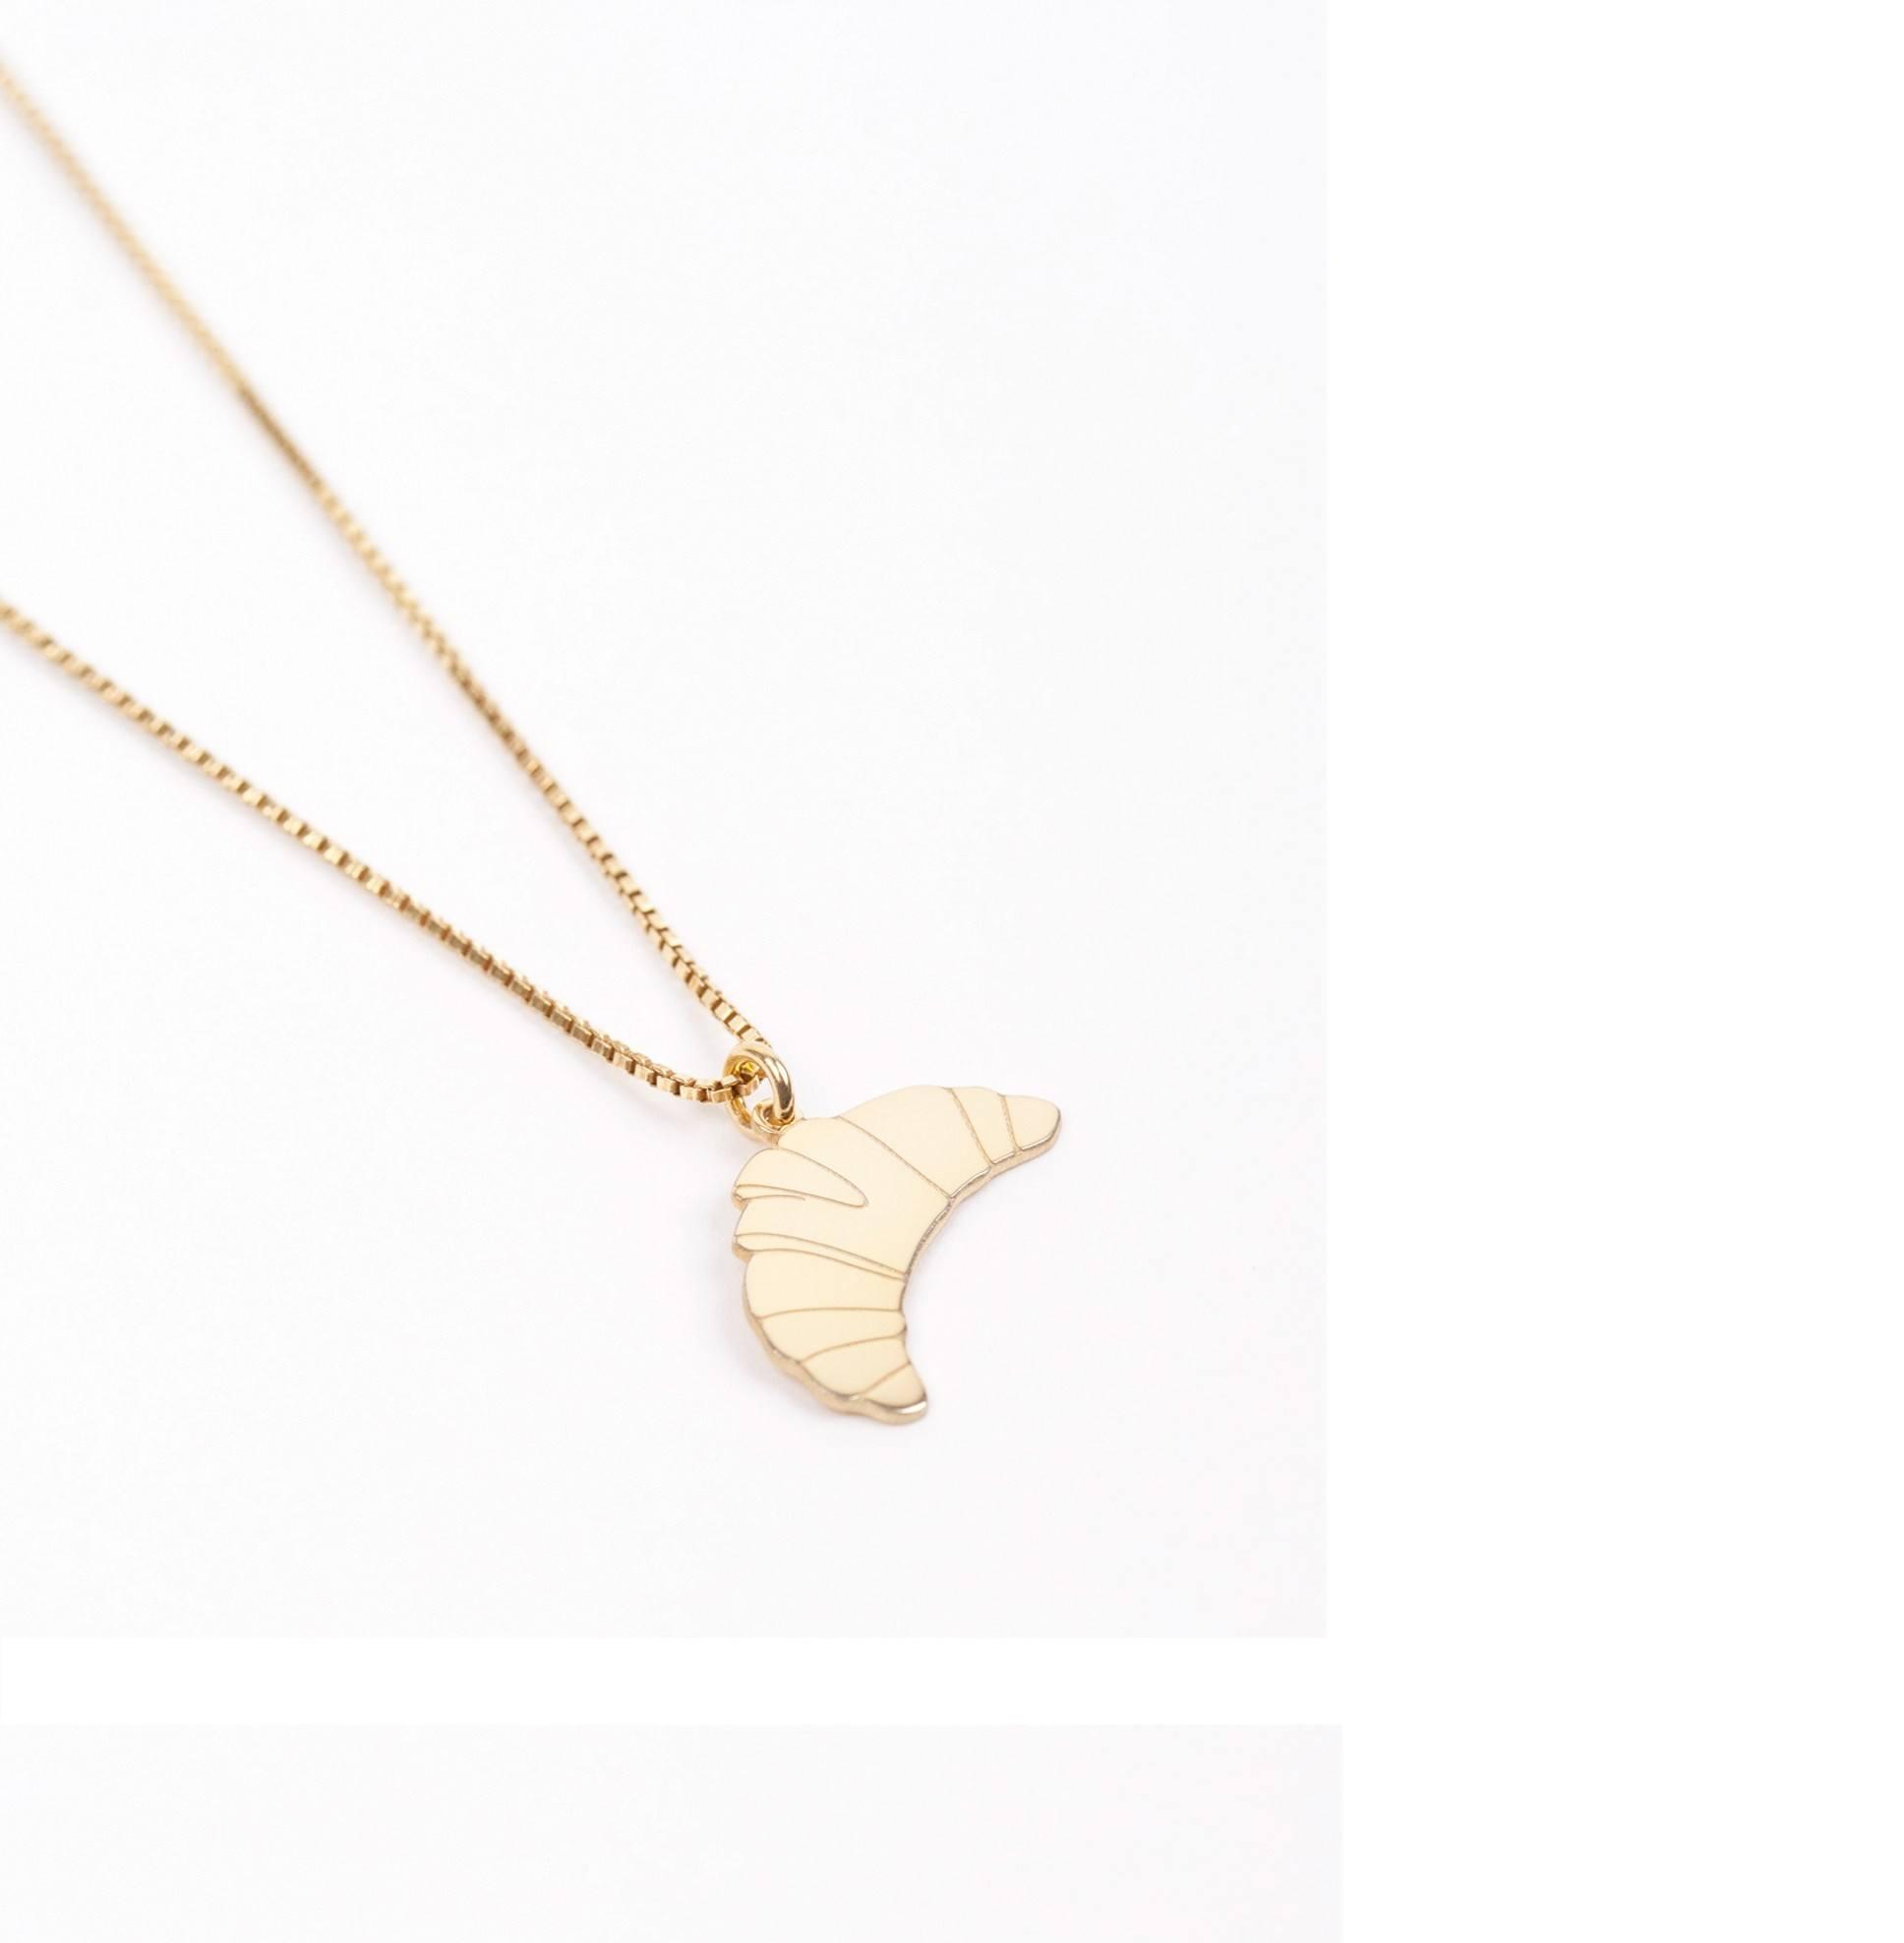 https://www.selecteddesigners.dk/media/catalog/product/j/u/jukserei-croissant-necklace-website.jpg